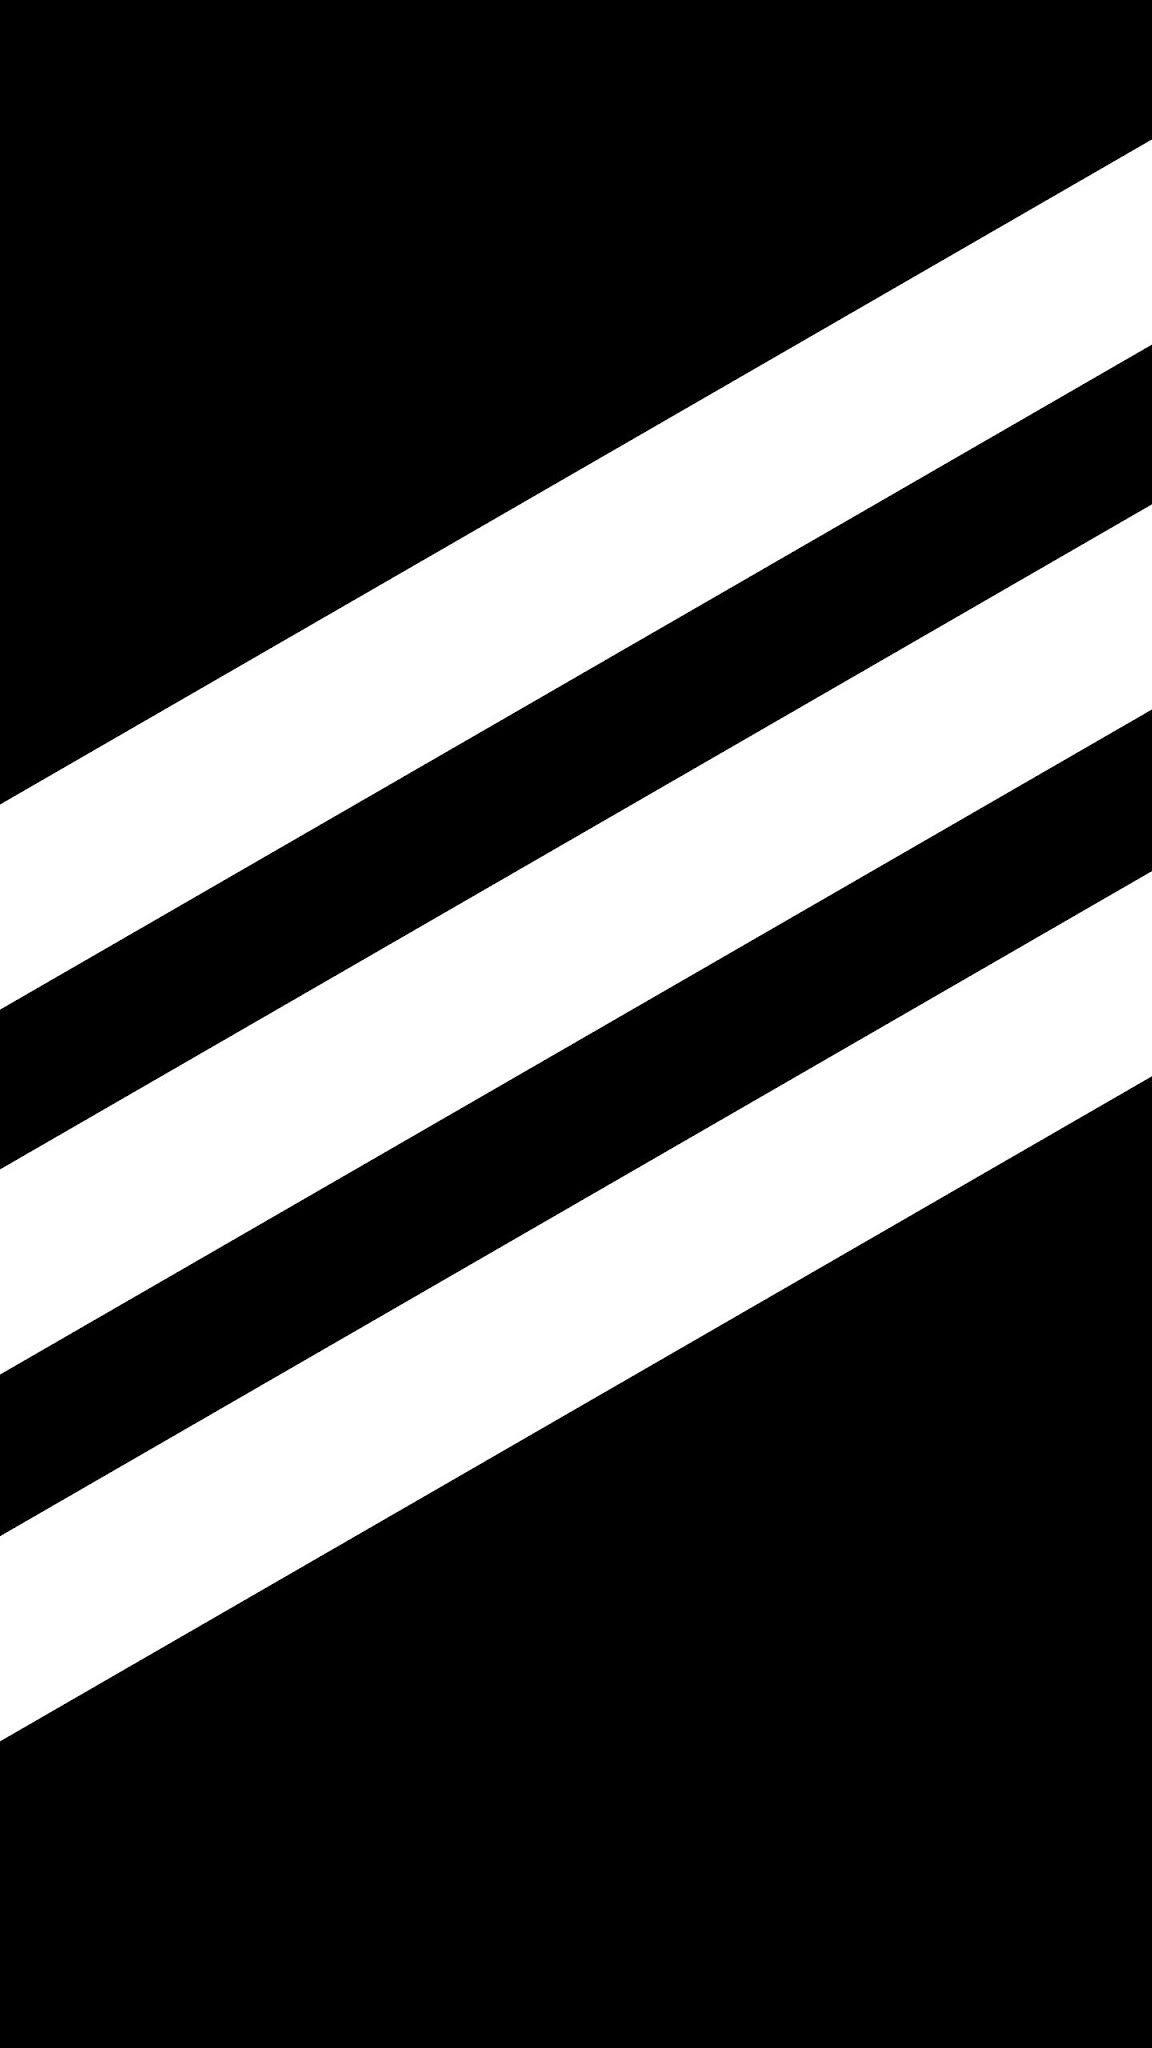 Pertama Adidas Wallpapers Colorful Wallpaper Black And White Wallpaper Iphone